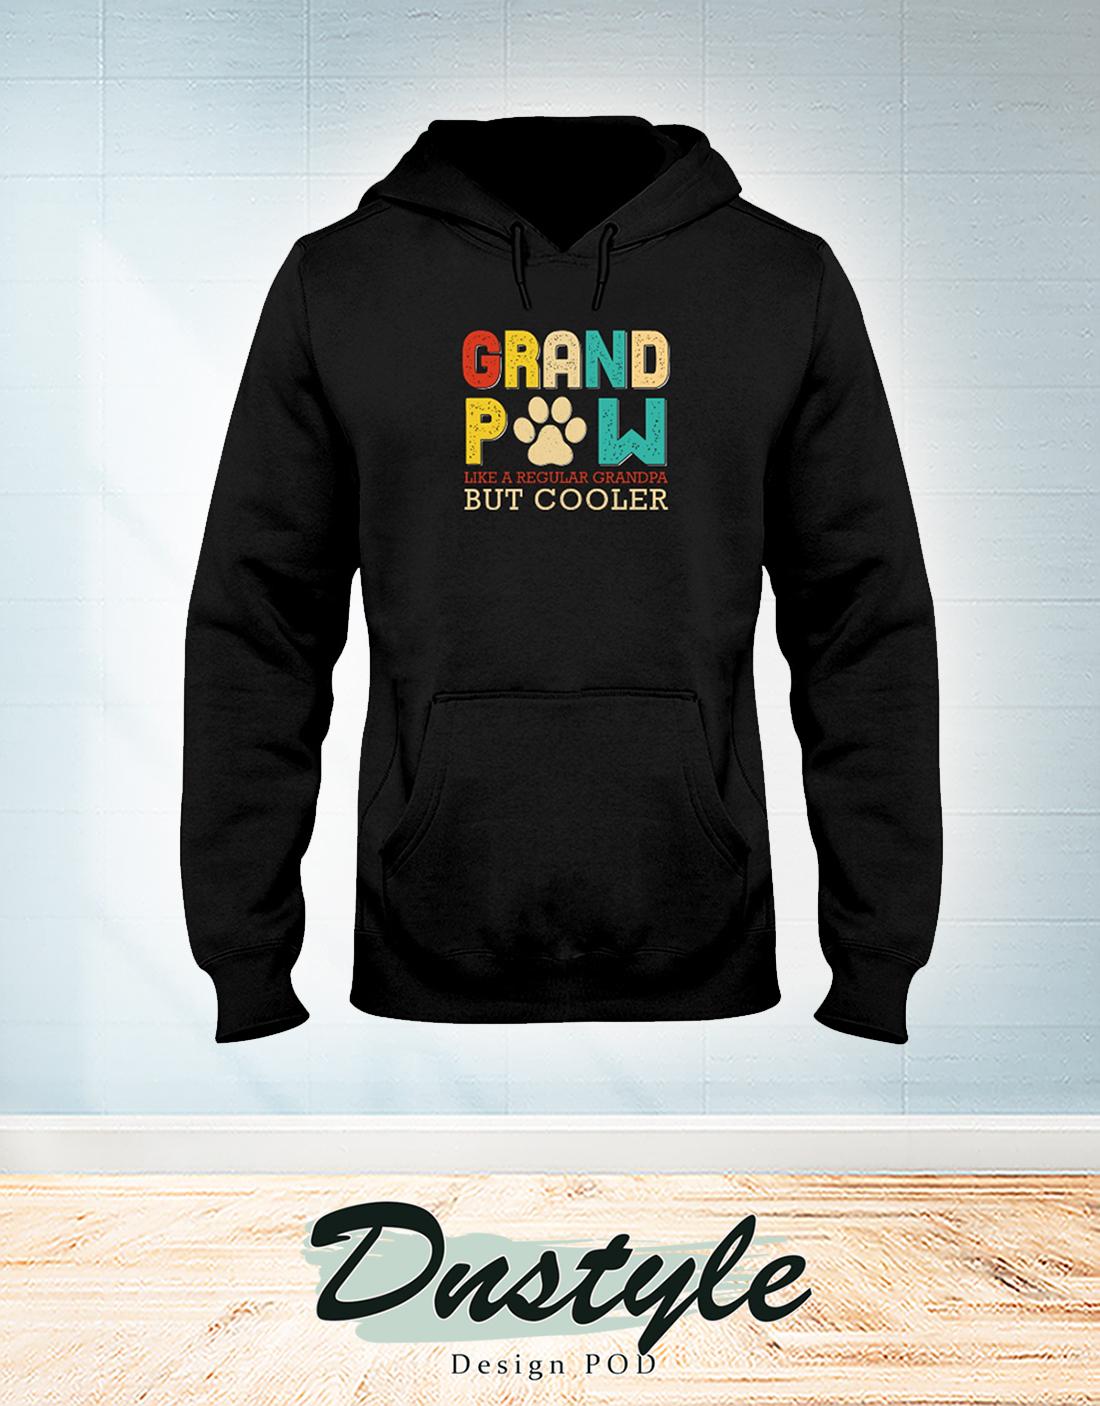 Vintage Grand Paw like a regular grandpa but cooler hoodie